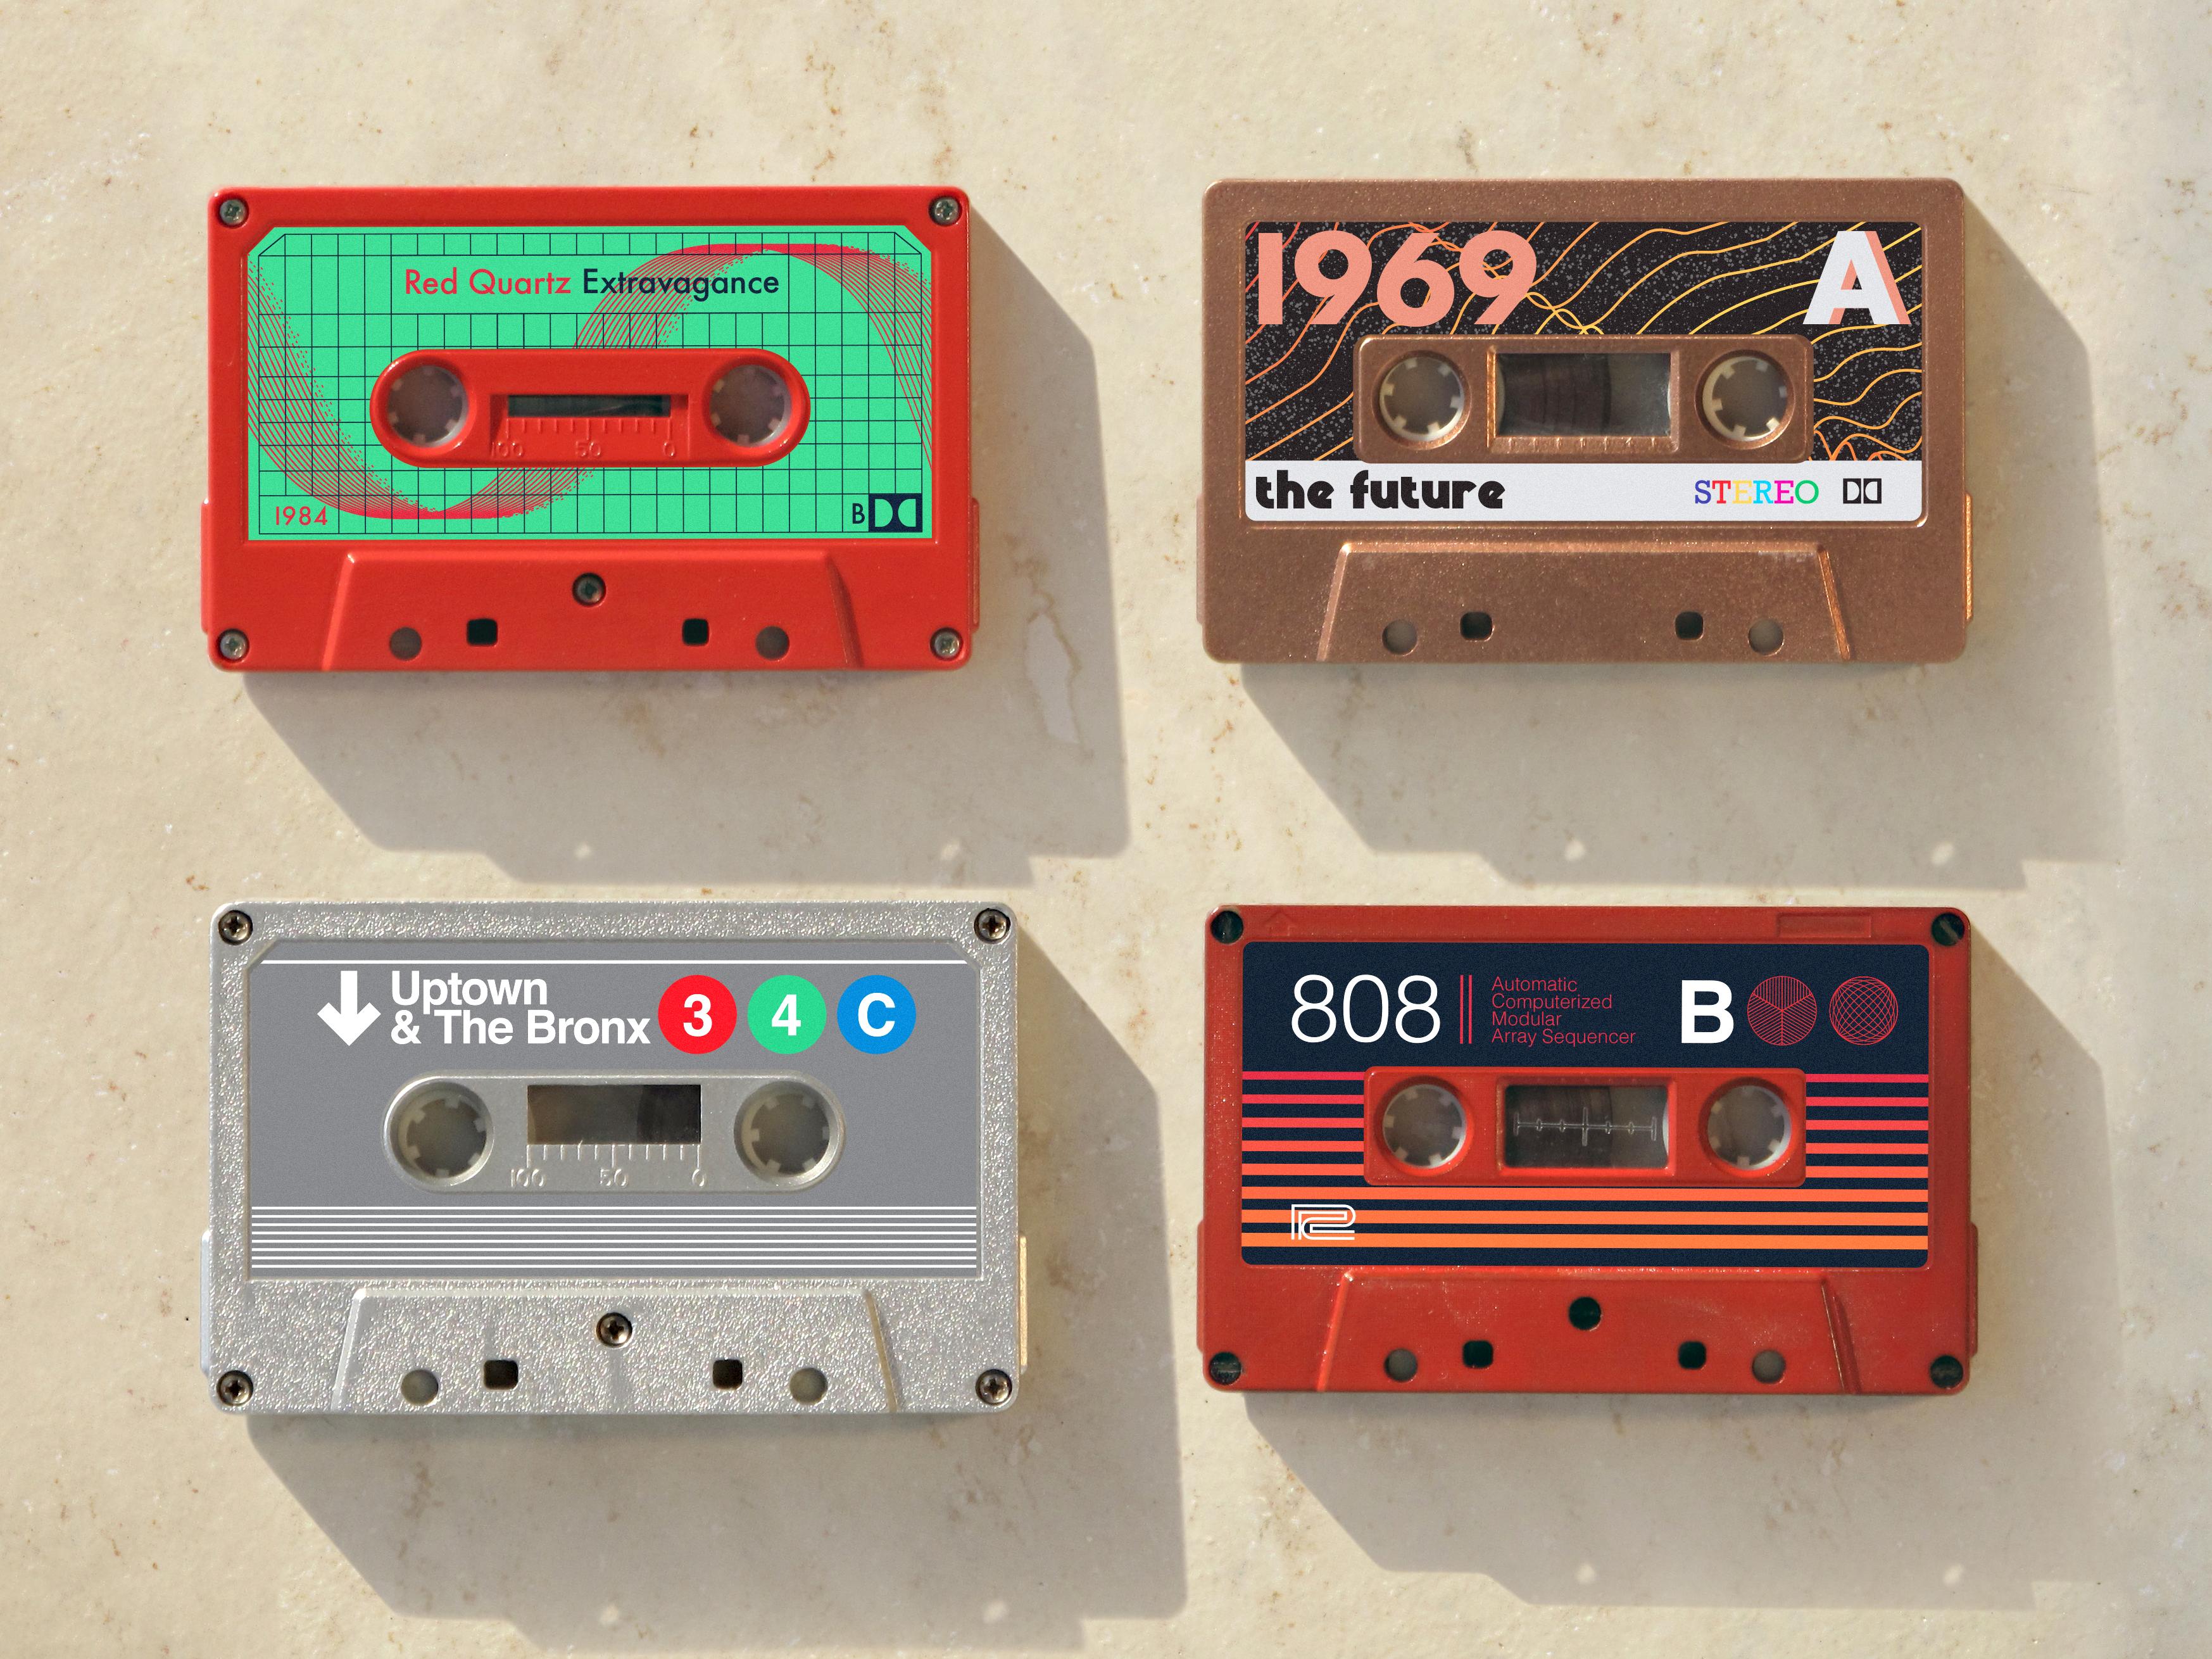 Cassette labels for fun